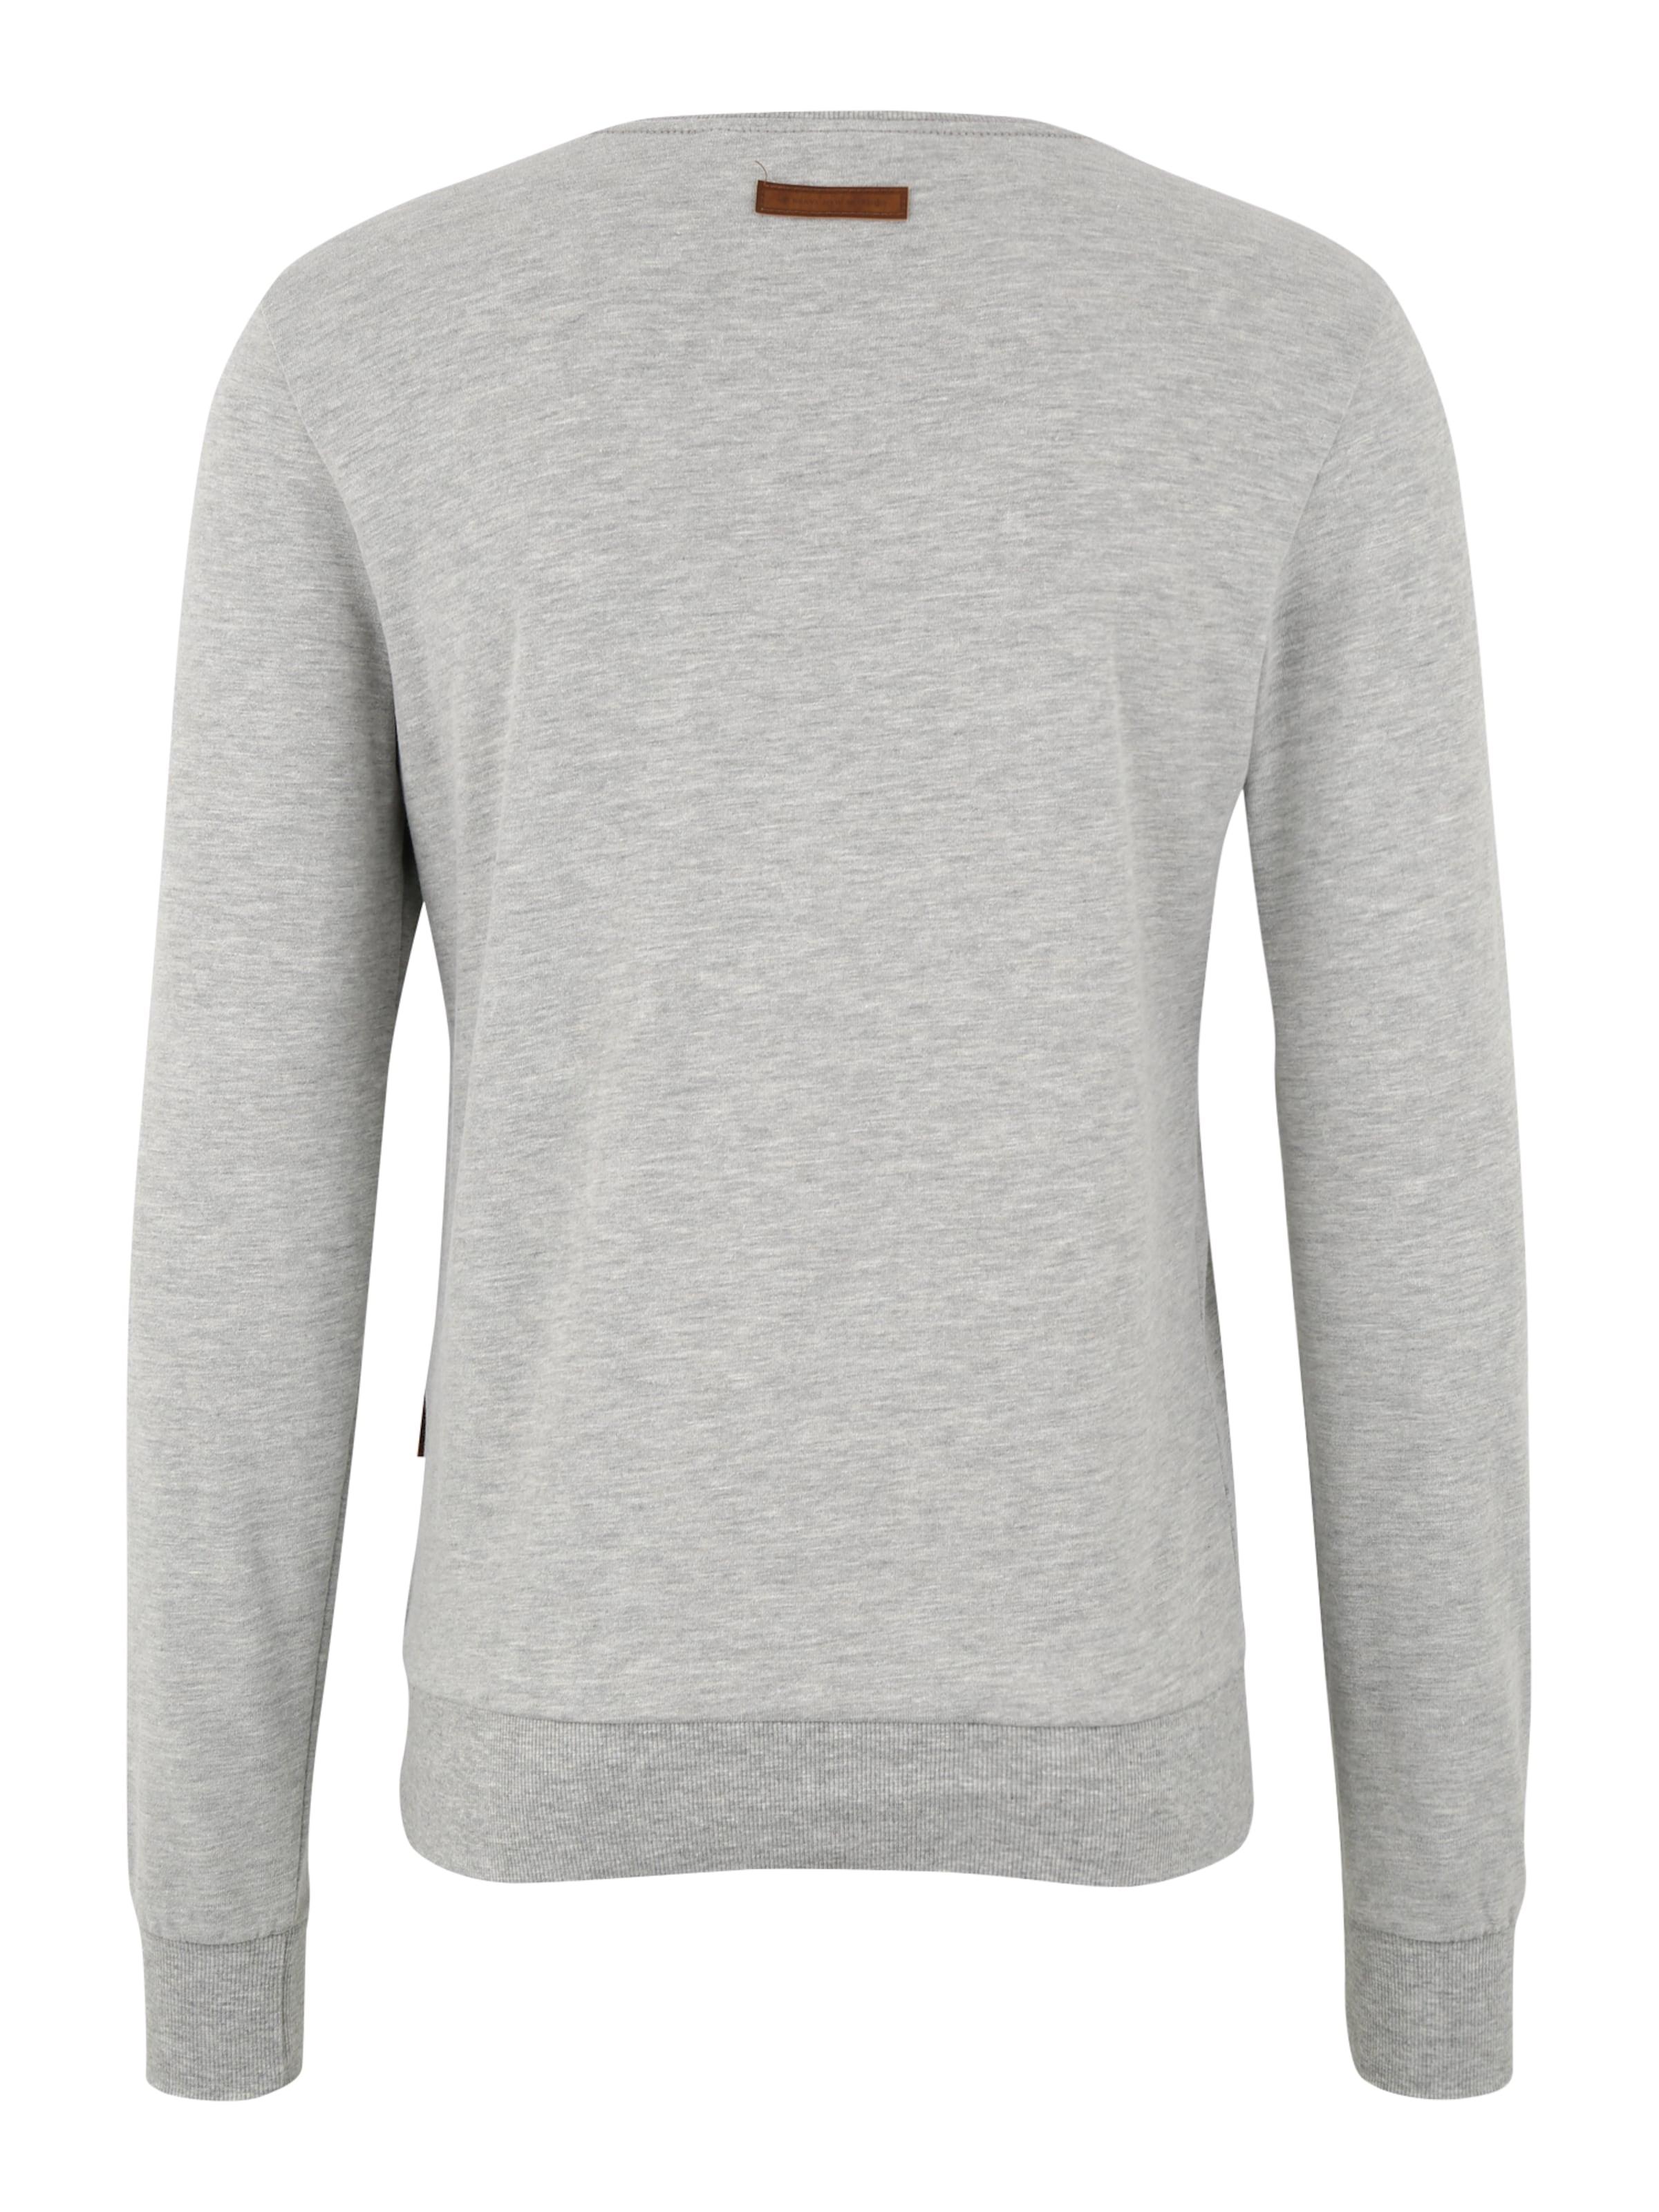 Sweatshirt In Lichtgrijs K ohol' 'al Naketano dtQBosrxhC